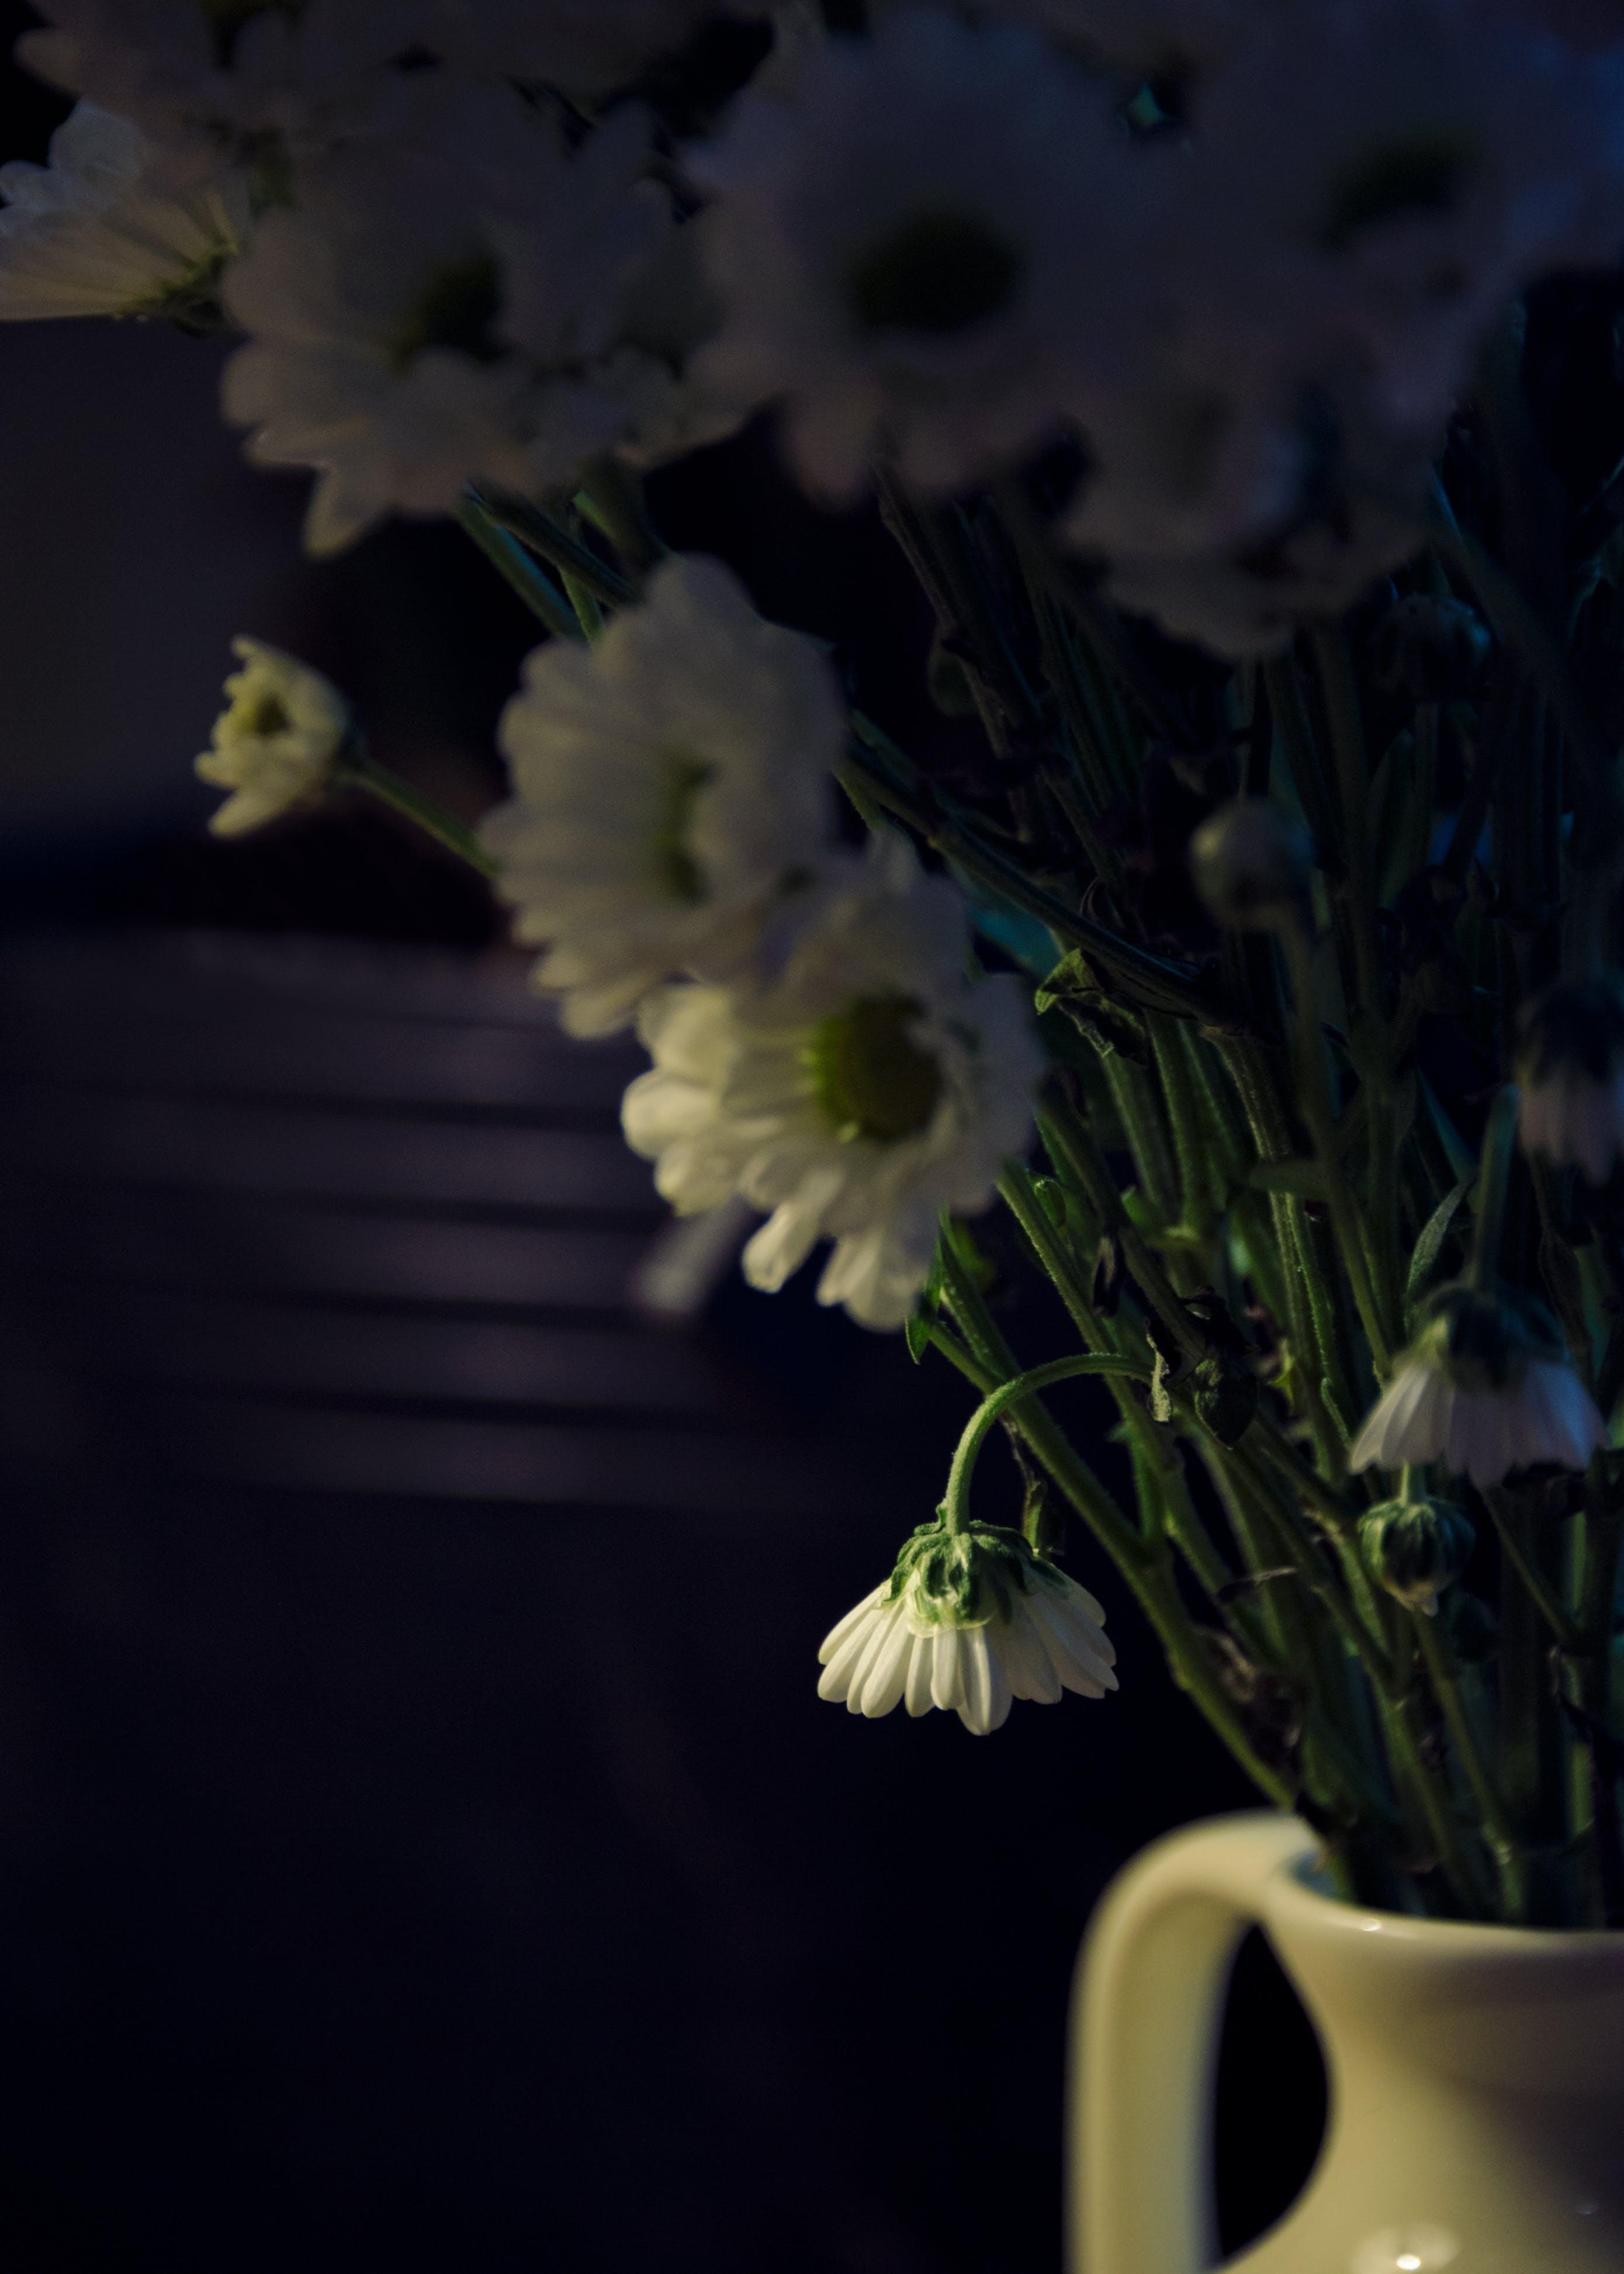 Close-Up Photo of White Flowers On Flower Vase